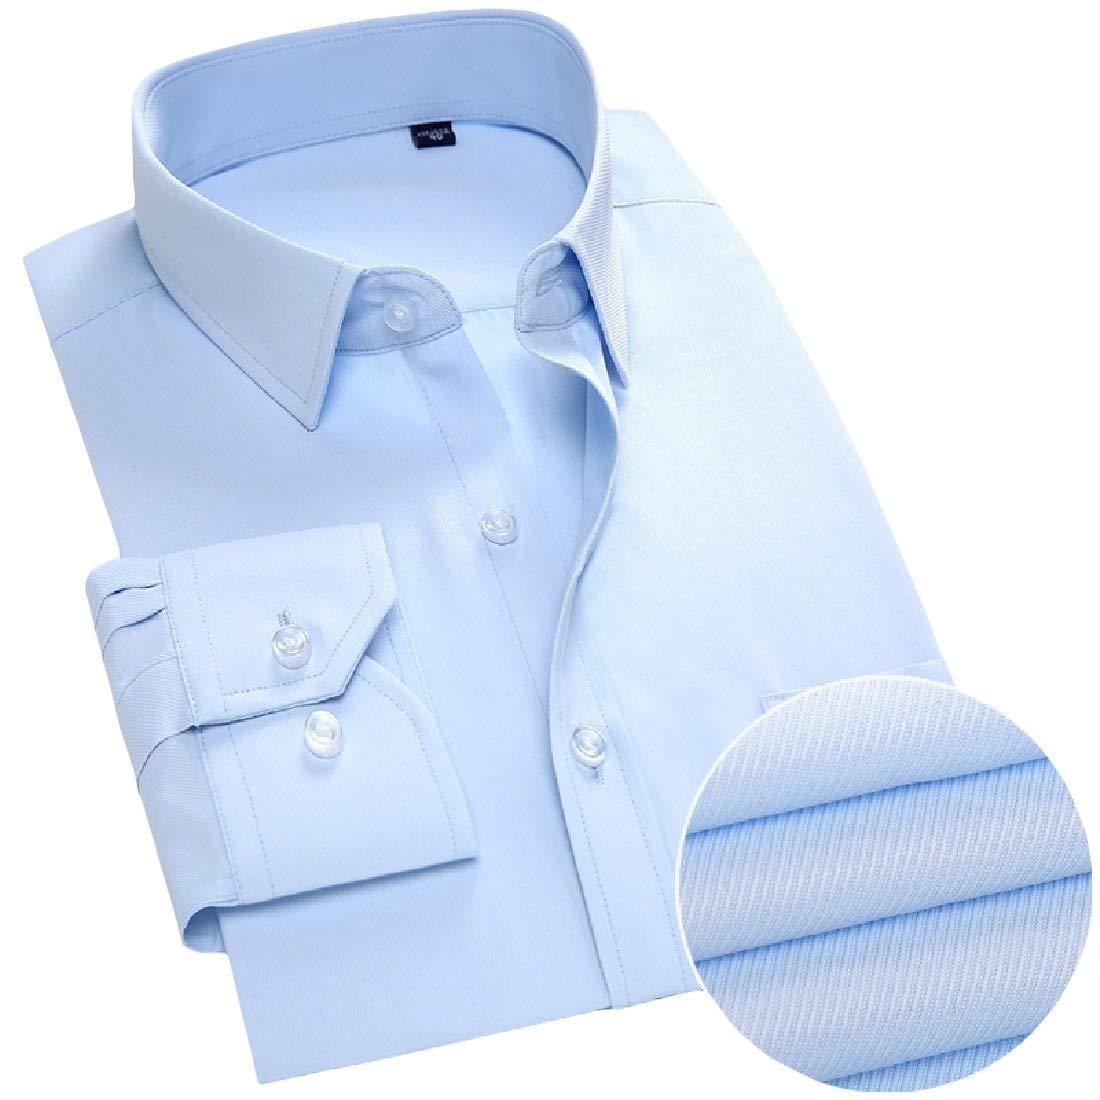 Freely Mens Business Plus Size Long Sleeve Cotton Lapel Button Top Dress Shirts